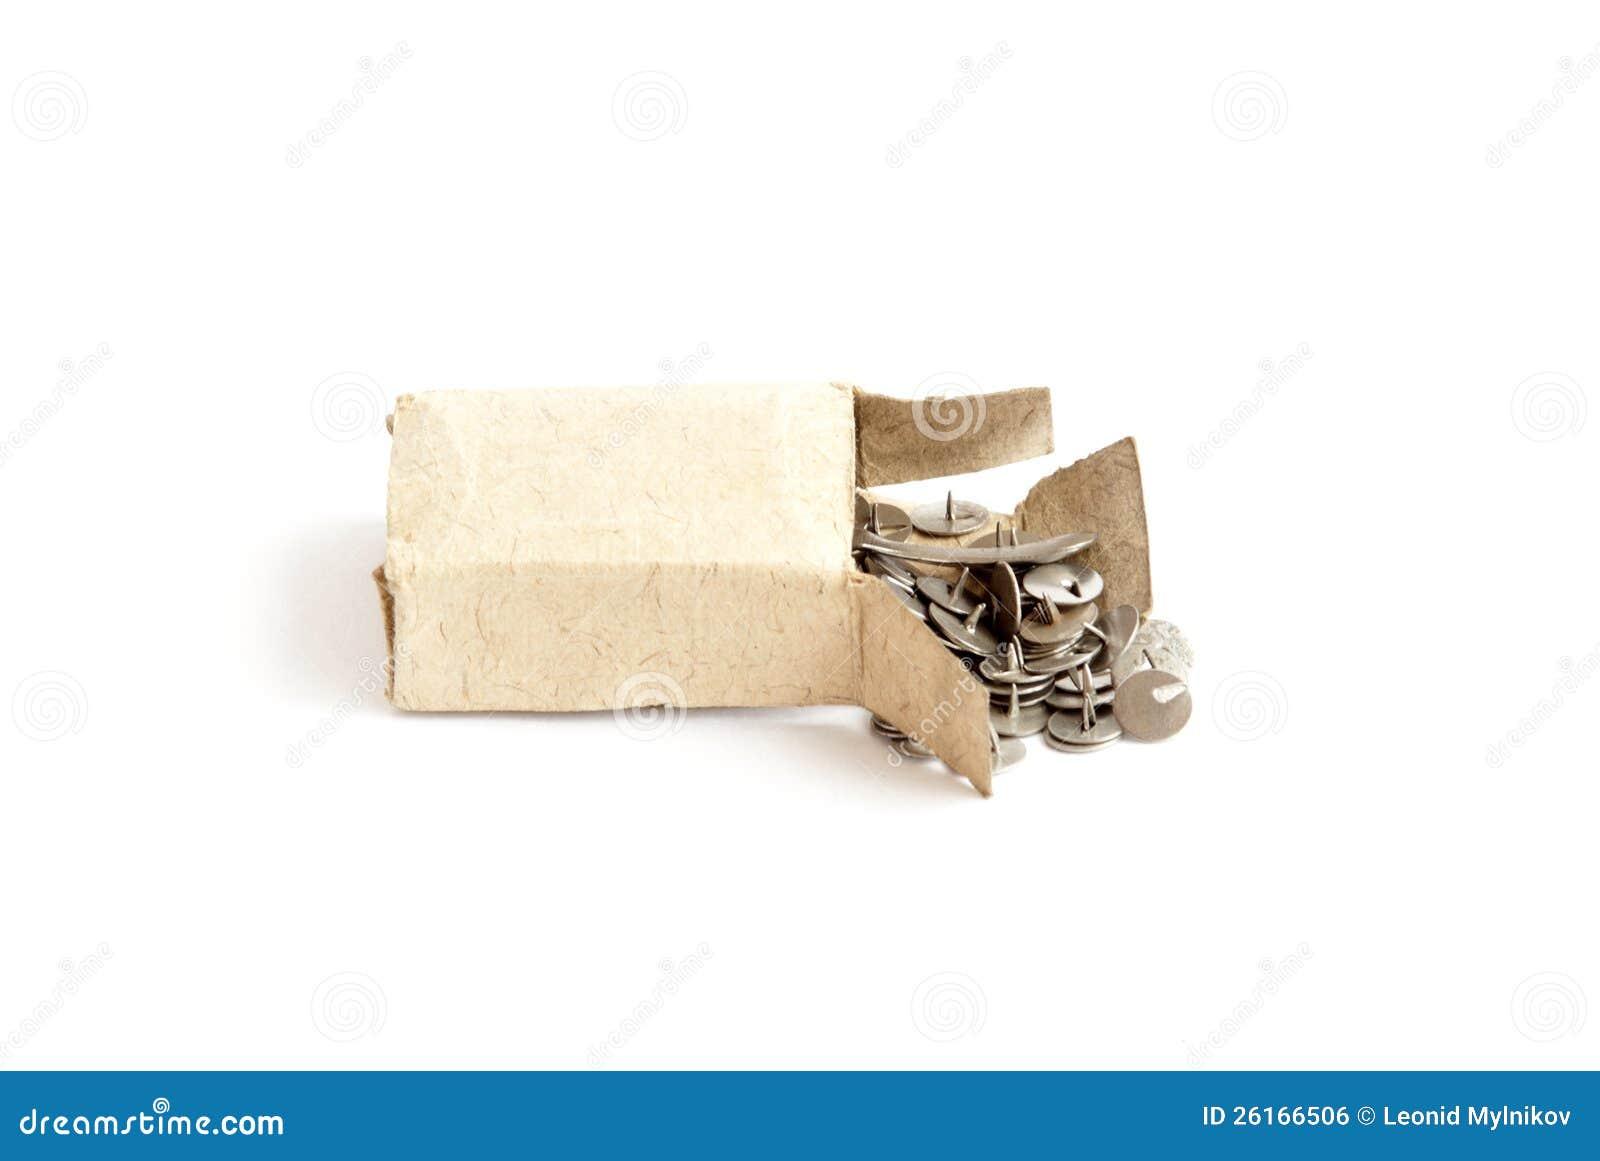 Reißnadel mit Kasten